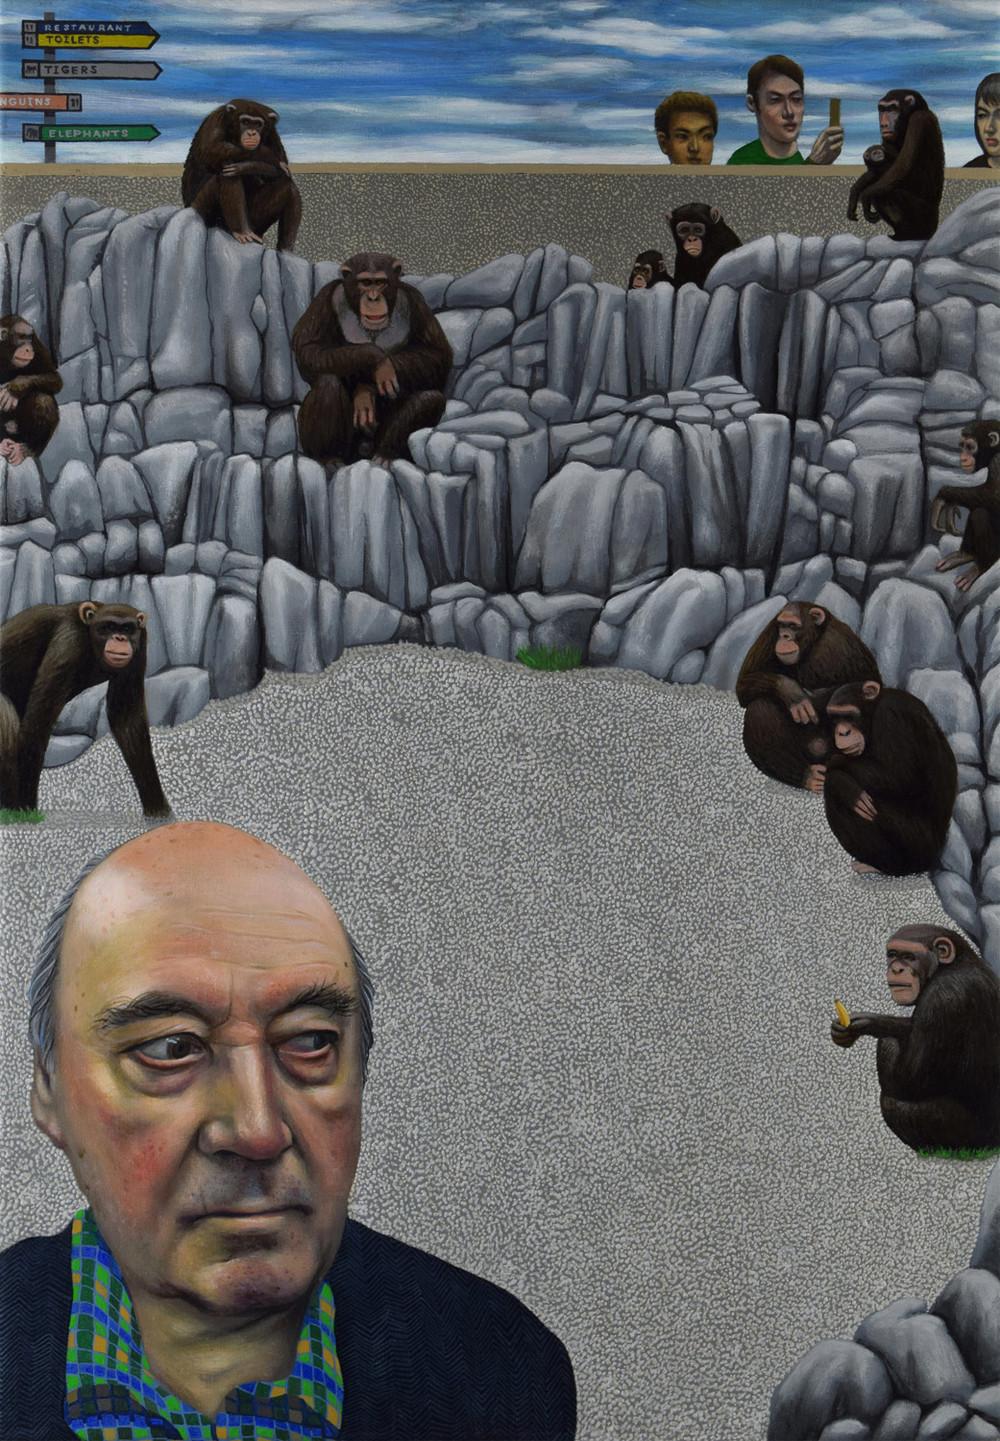 Zoologist Desmond Morris and The Monkey Pen